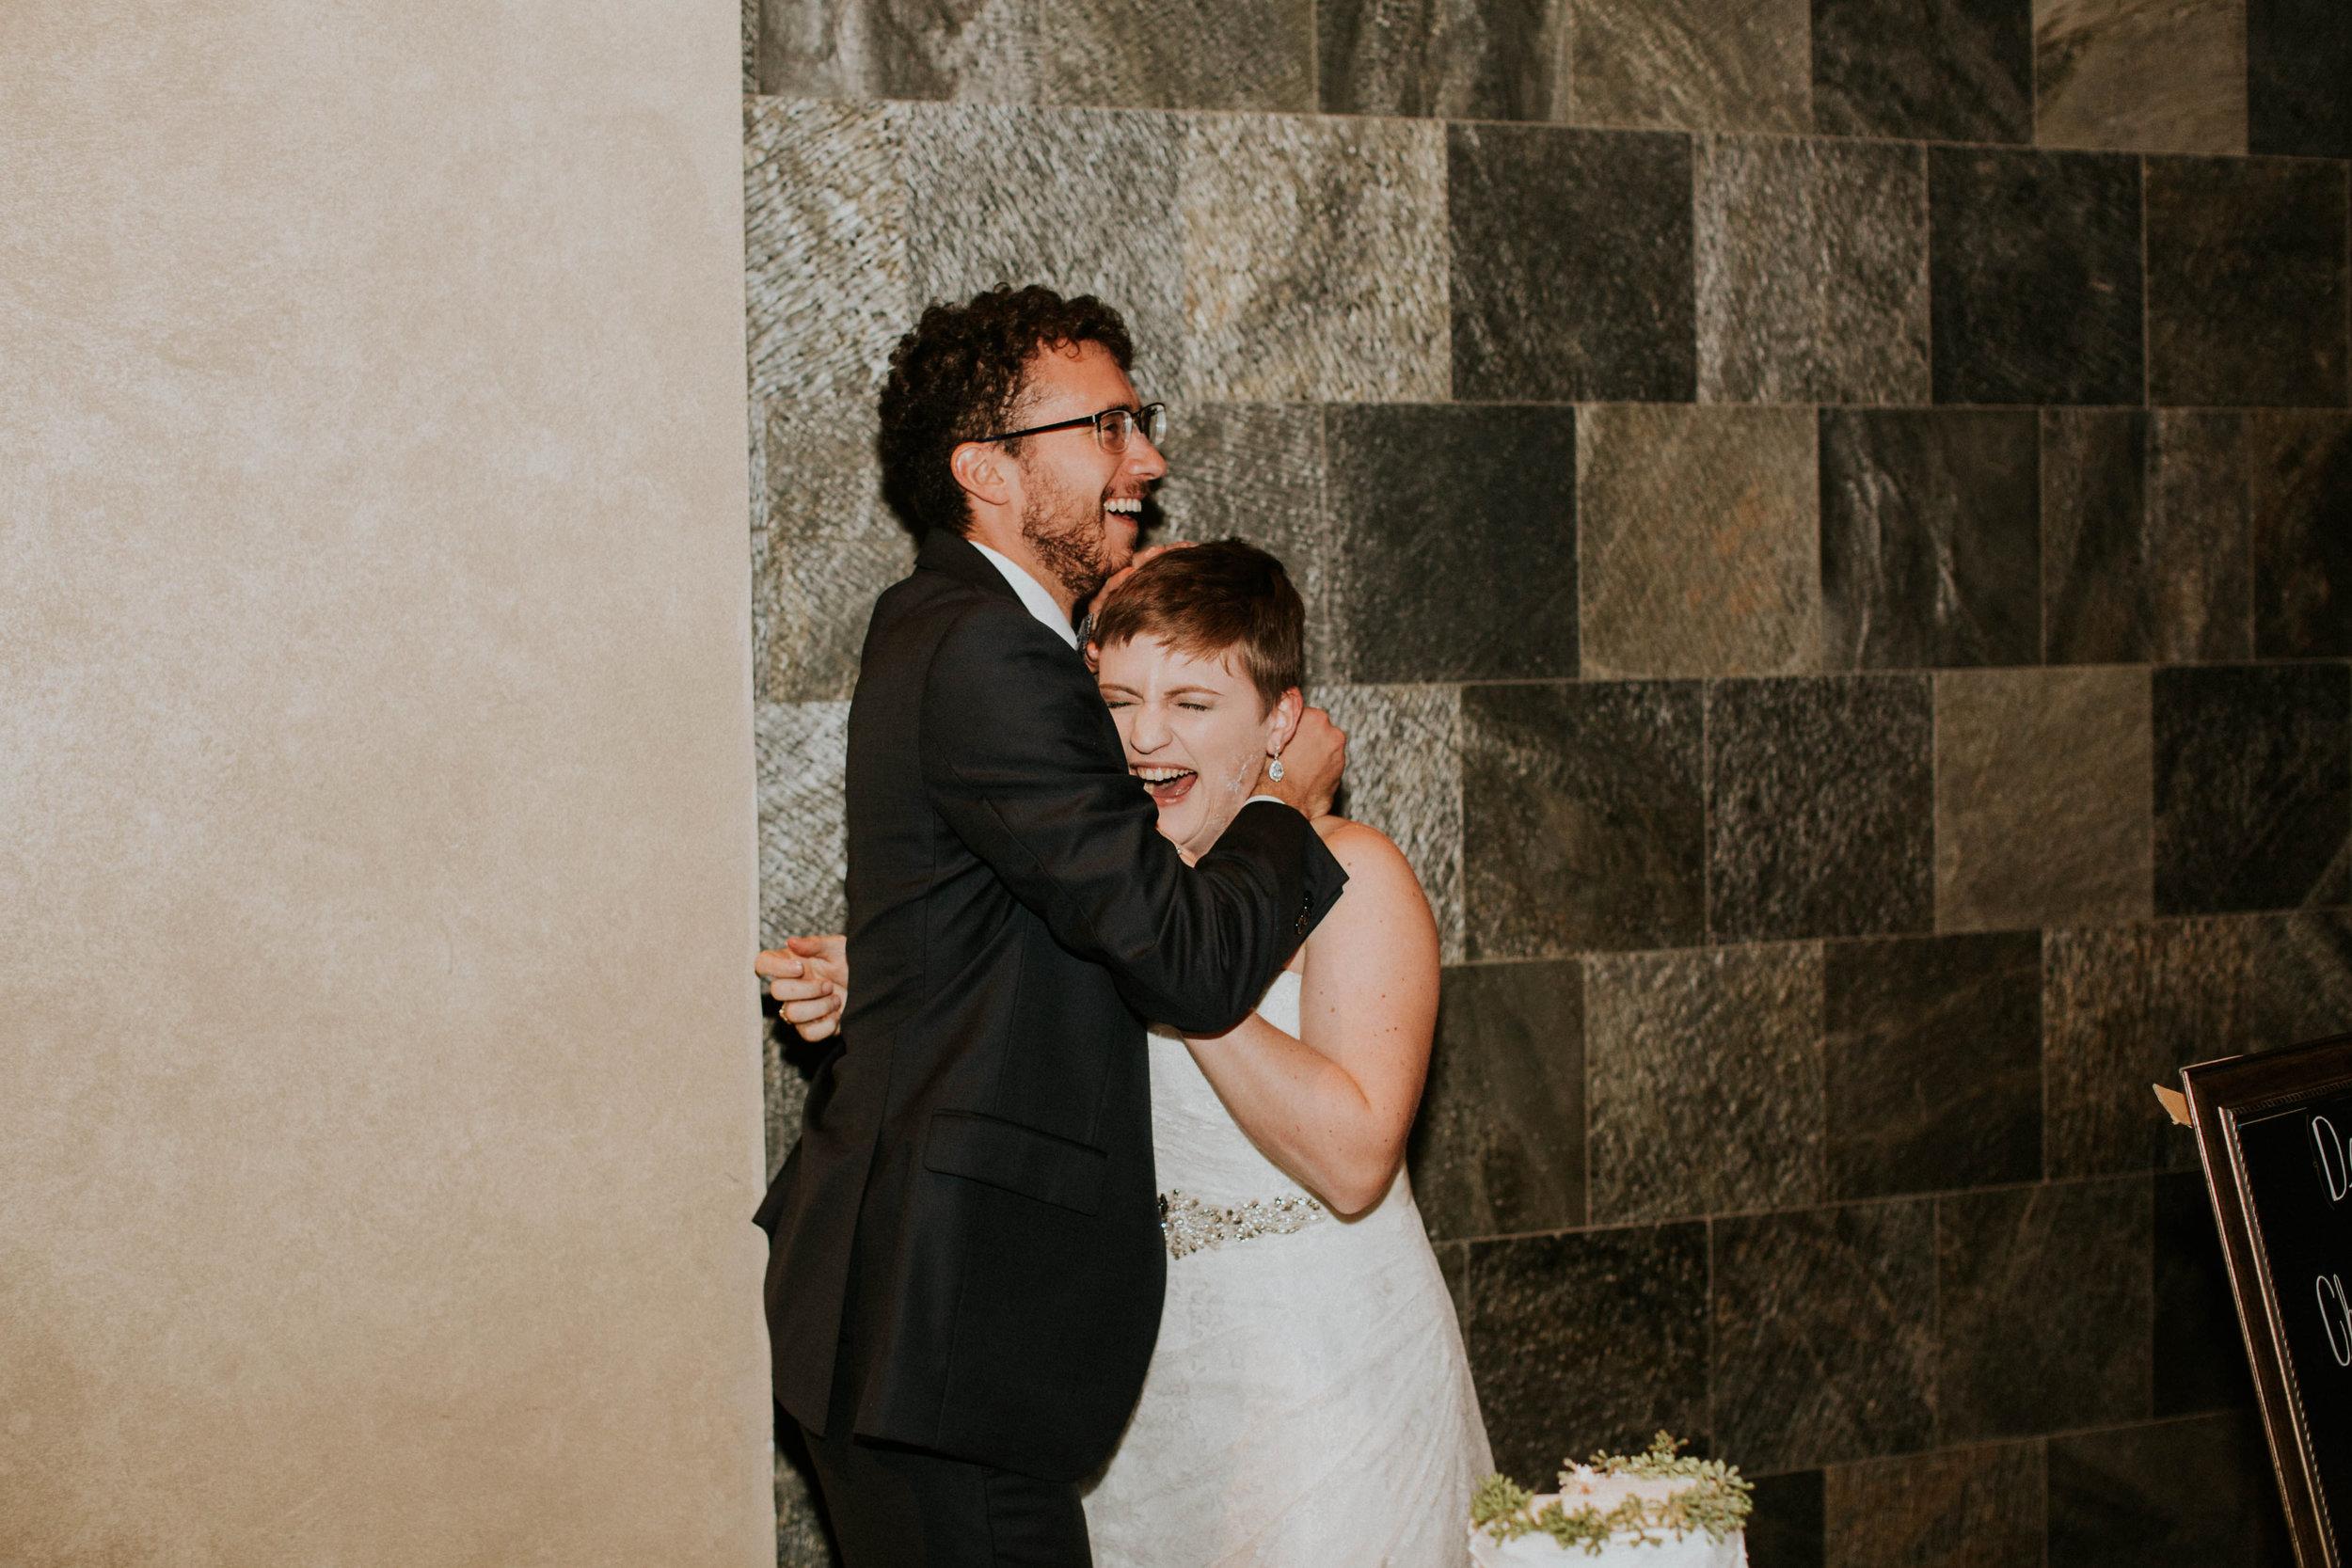 Columbus ohio wedding photographer grace e jones photography real fun joyful wedding129.jpg